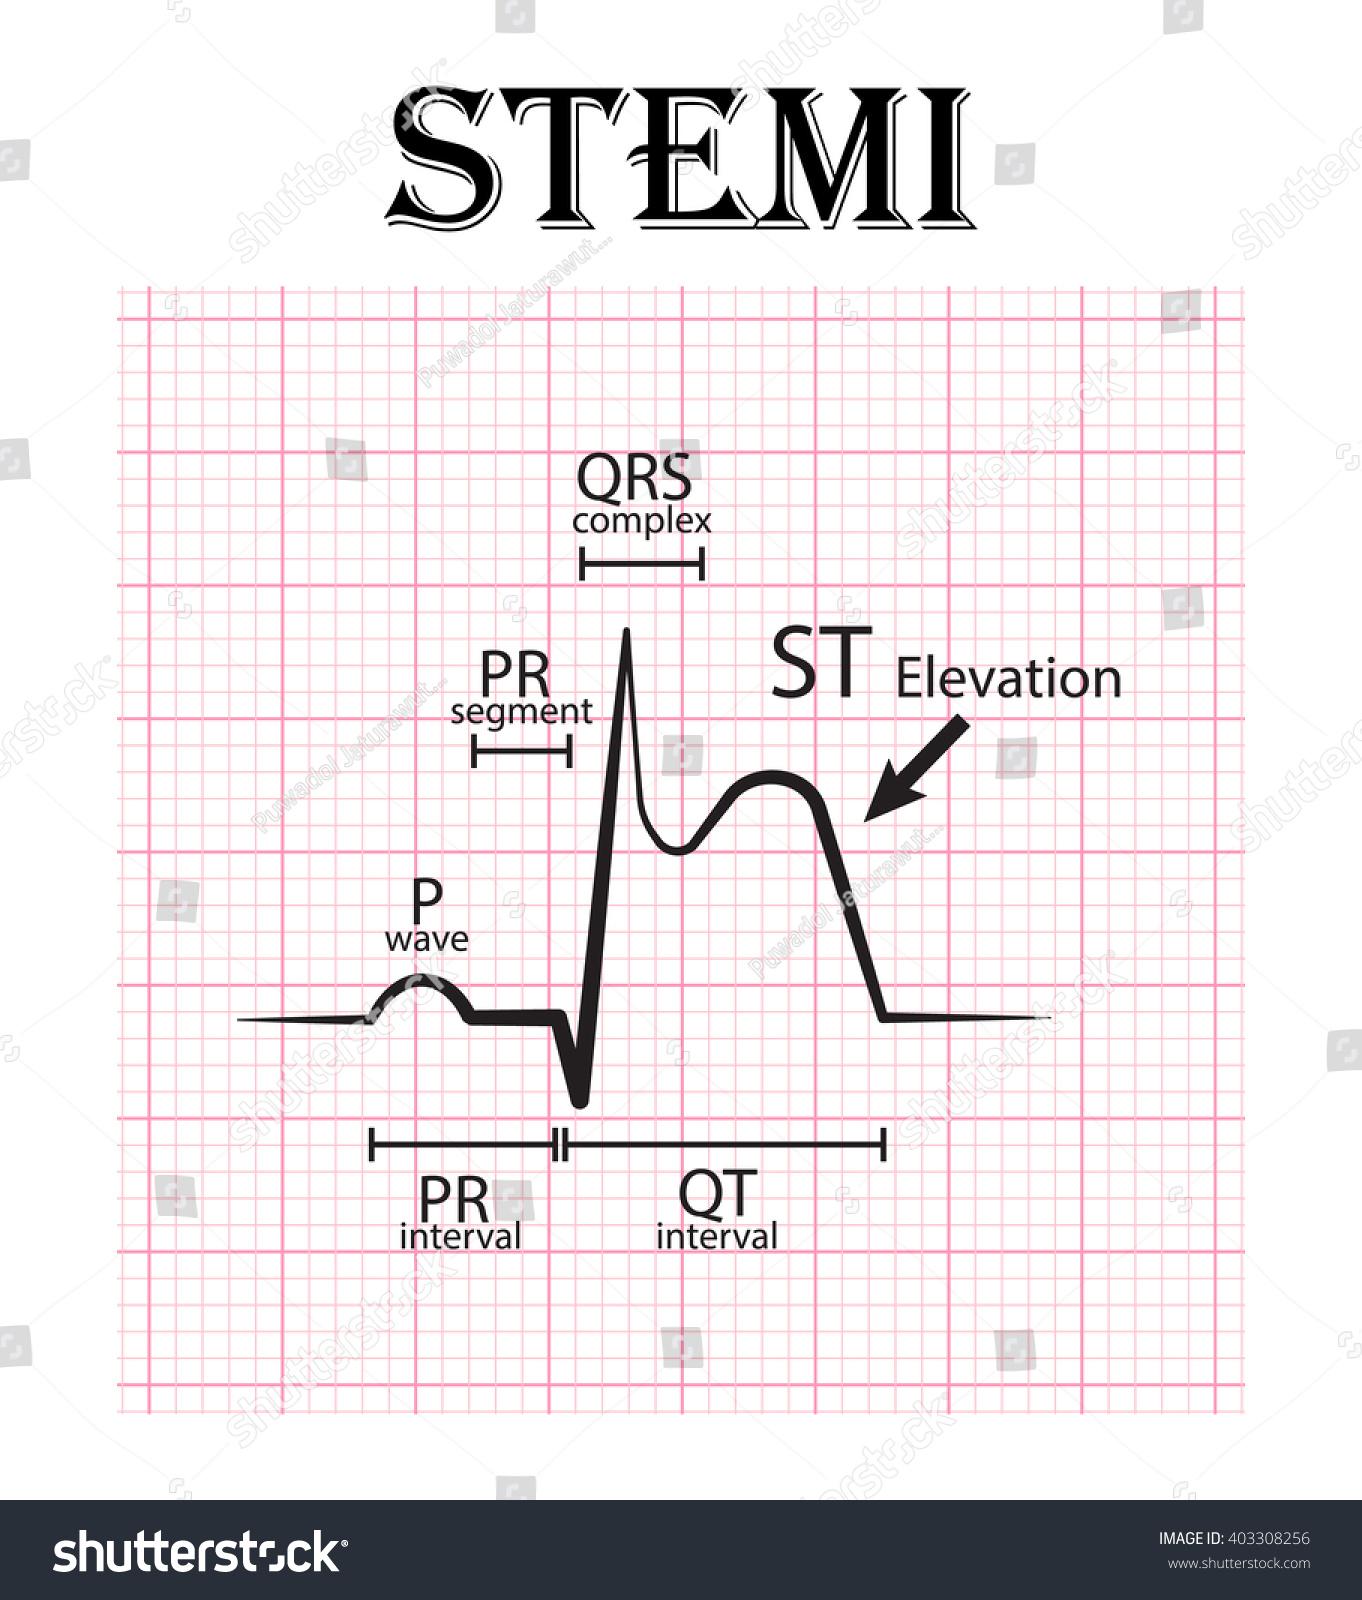 ecg st elevation myocardial infarction stemi stock vector ekg vector circle ekg vector art